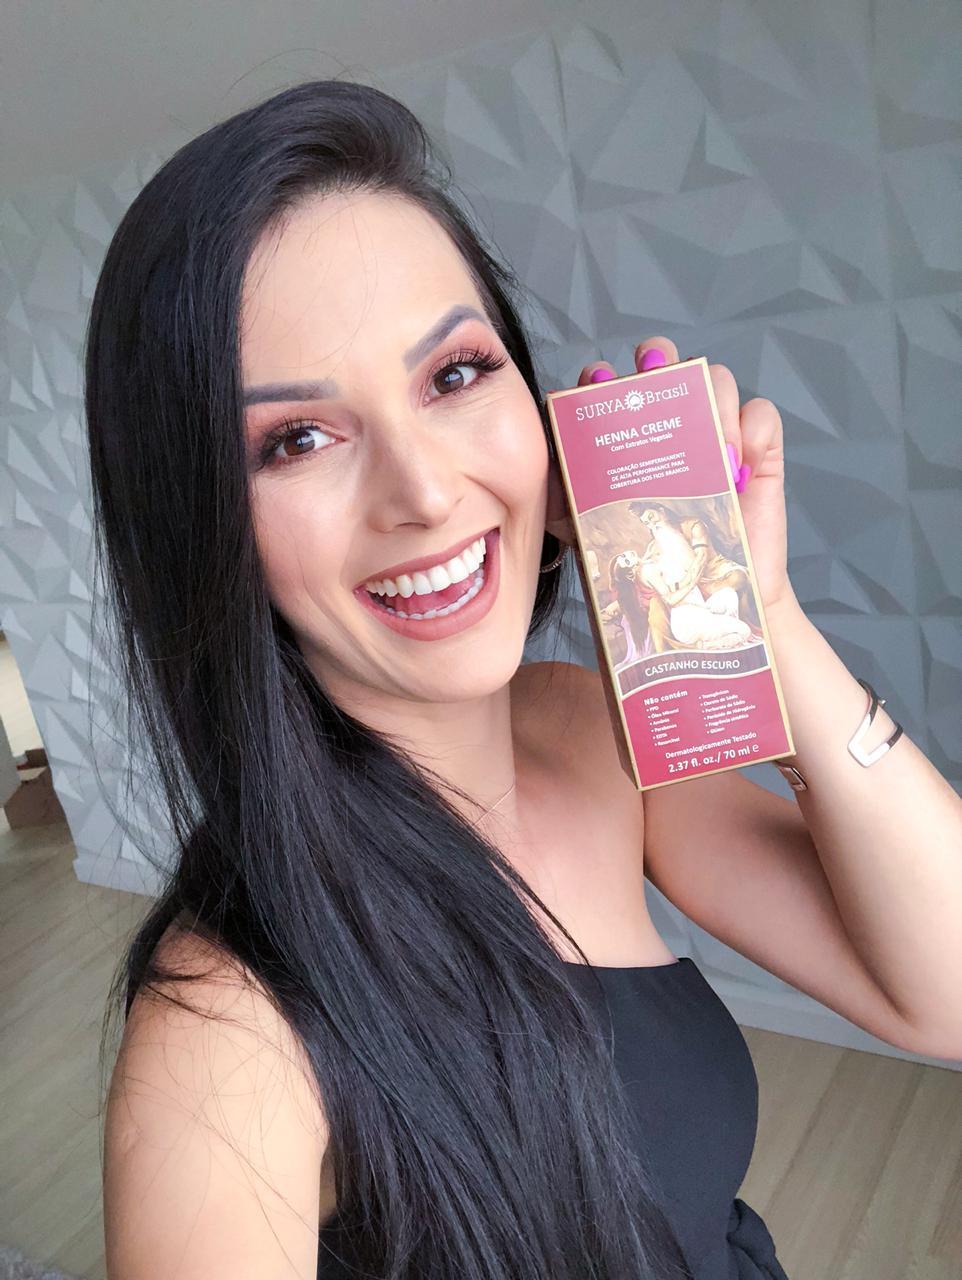 coloracao-cem-por-cento-vegana-henna-creme-da-surya-brasil-e-boa-resenha-tintura